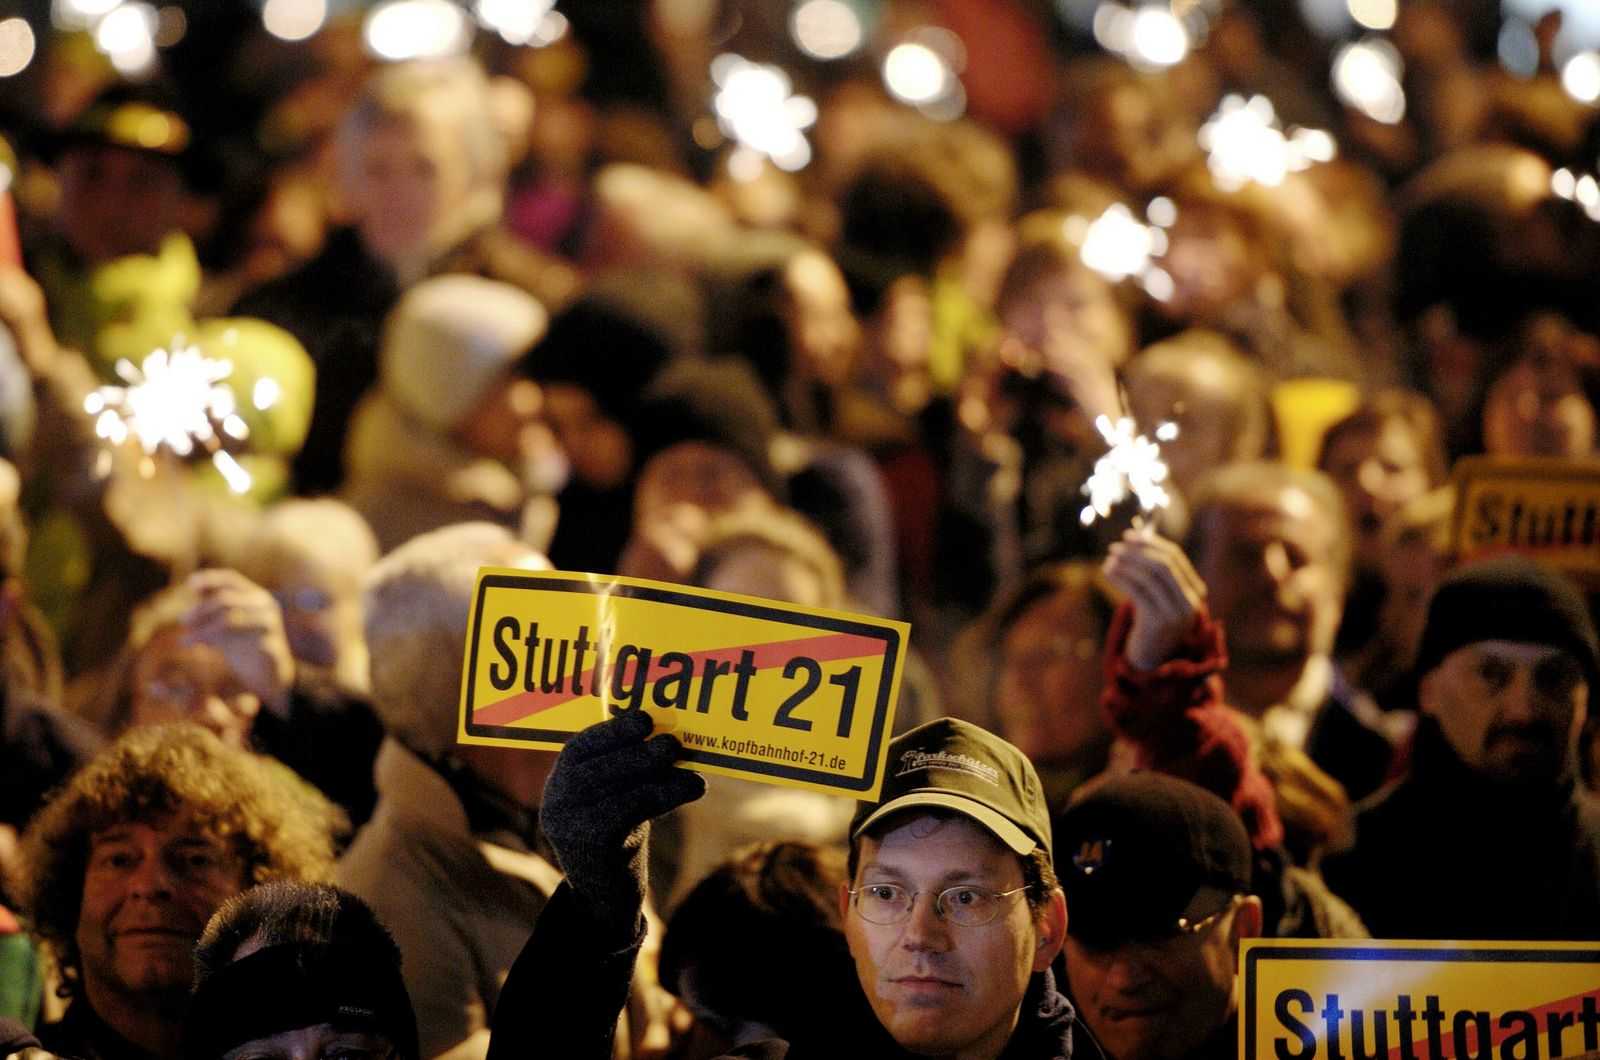 GERMANY-POLITICS-TRANSPORT-STUTTGART 21-REFERENDUM